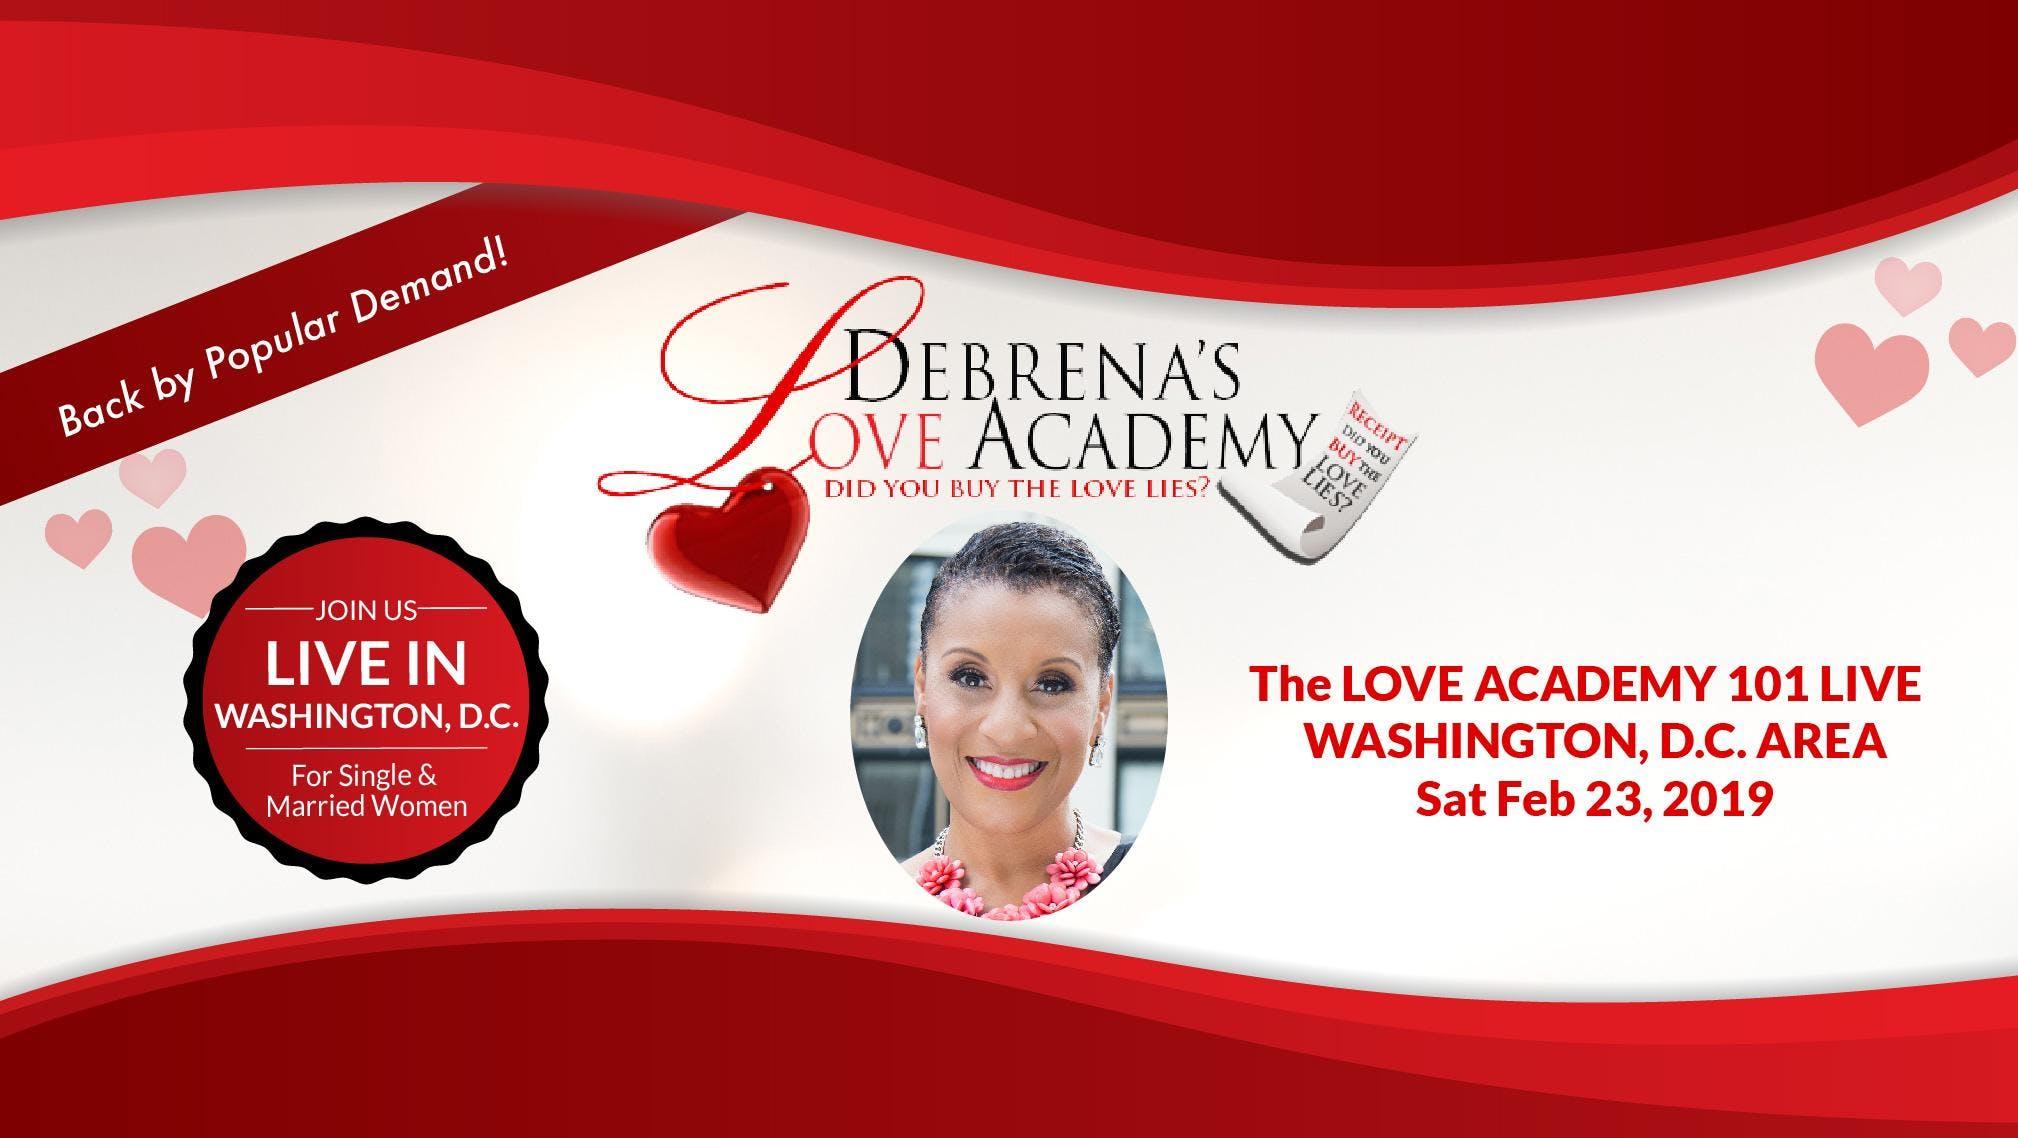 Love Academy 101 LIVE WA DC Sat February 23,